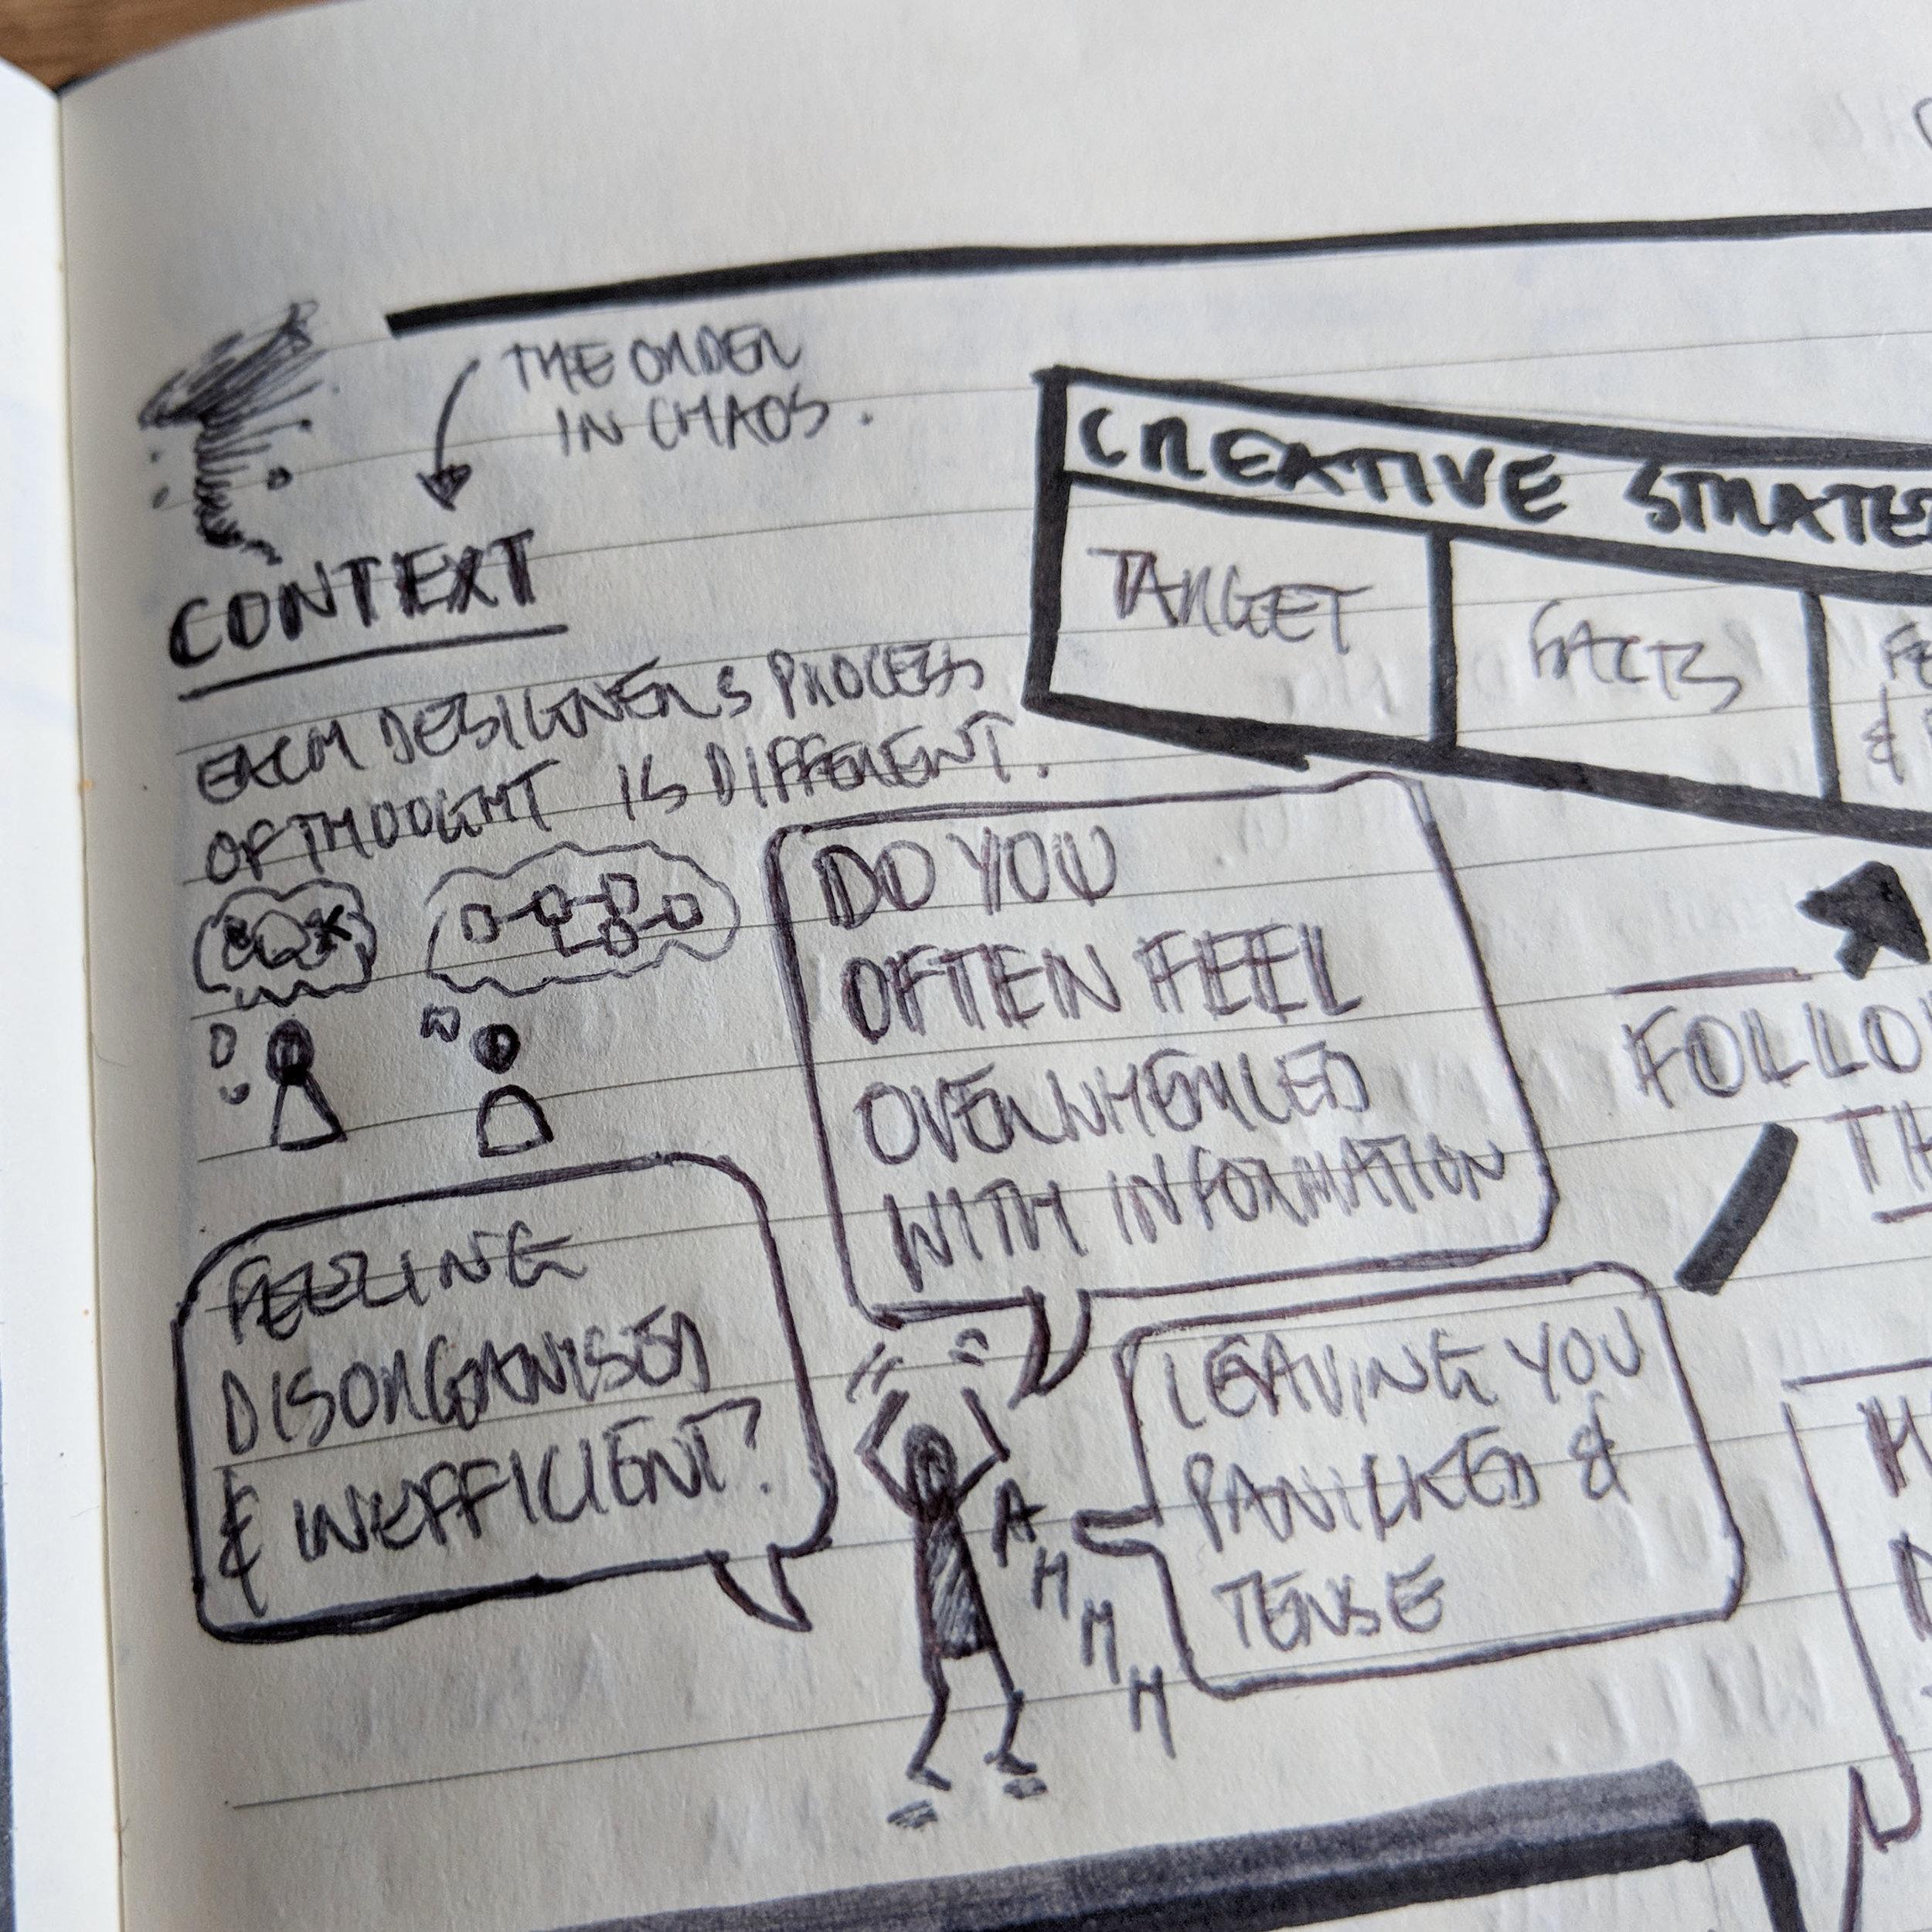 CreativeStrategyAndTheBusinessOfDesign_Part10.6.jpg